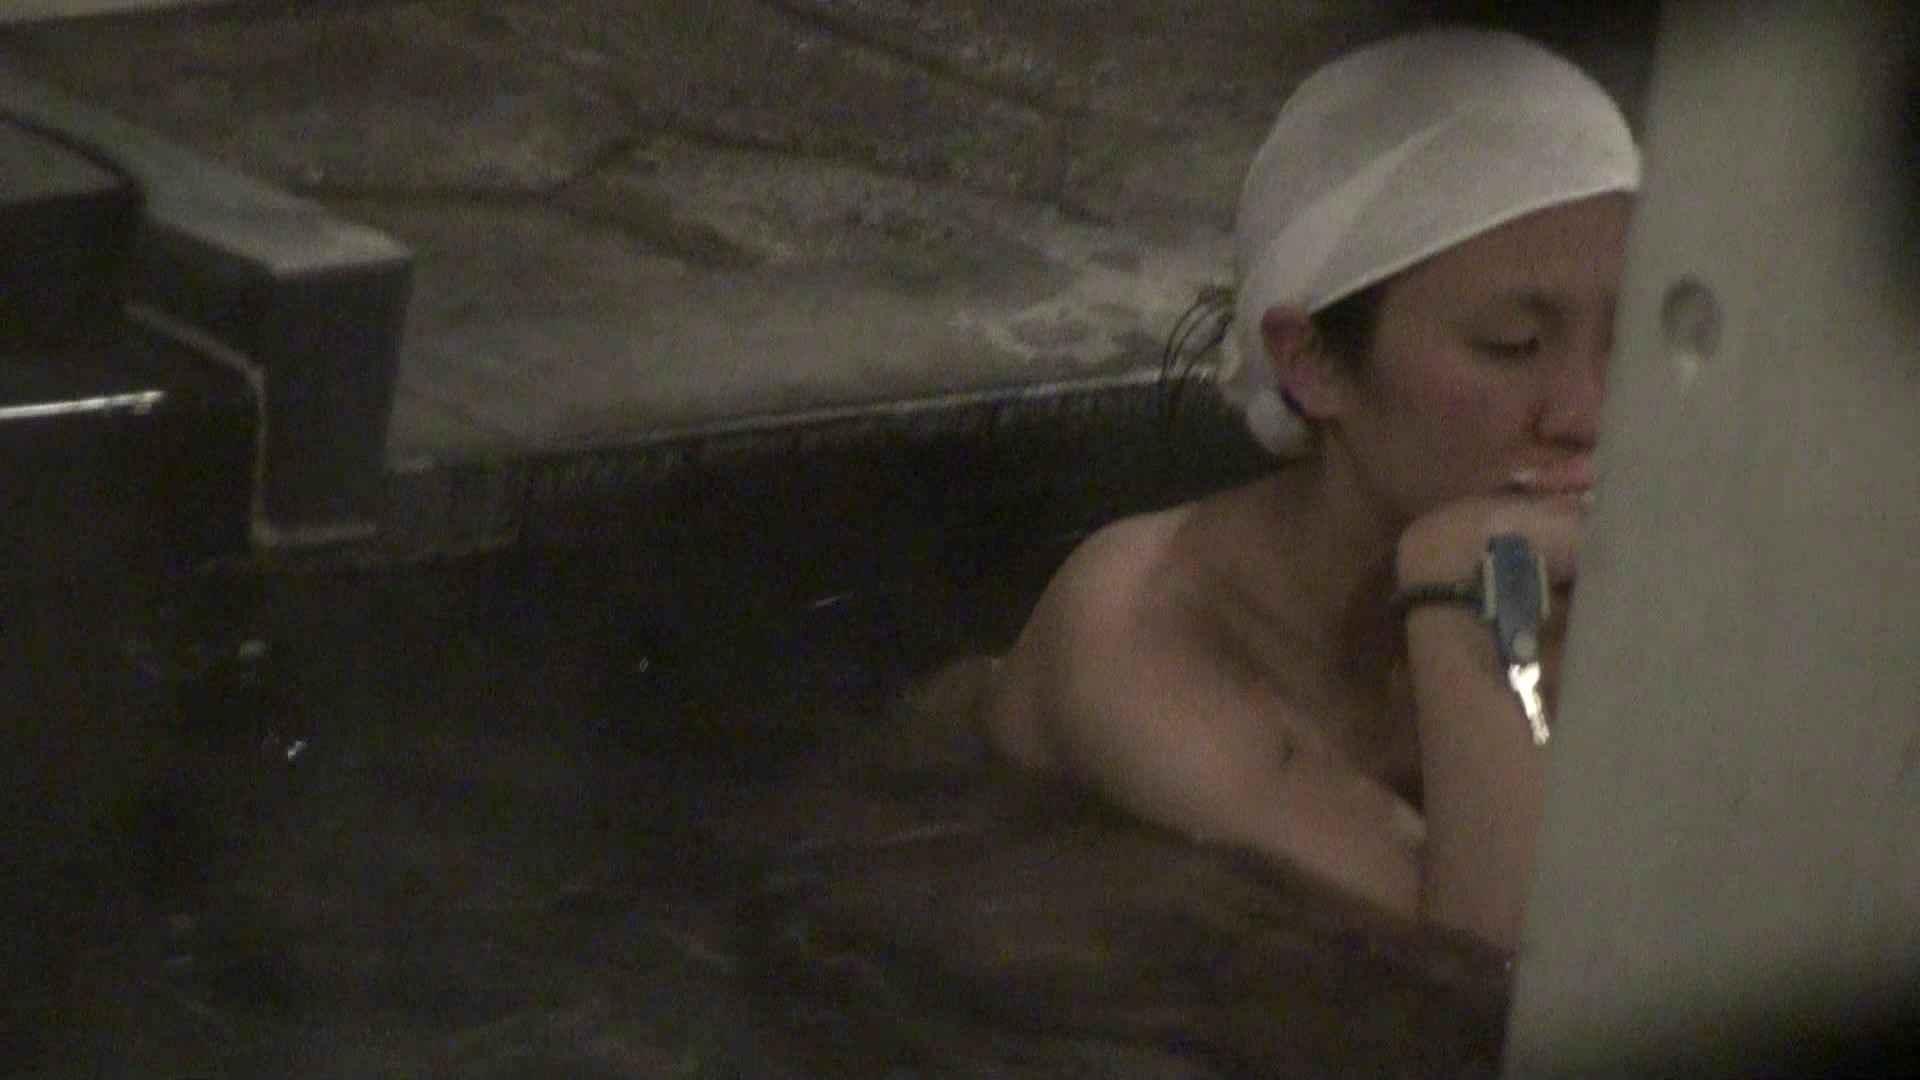 Aquaな露天風呂Vol.427 OLセックス | 露天  51画像 25